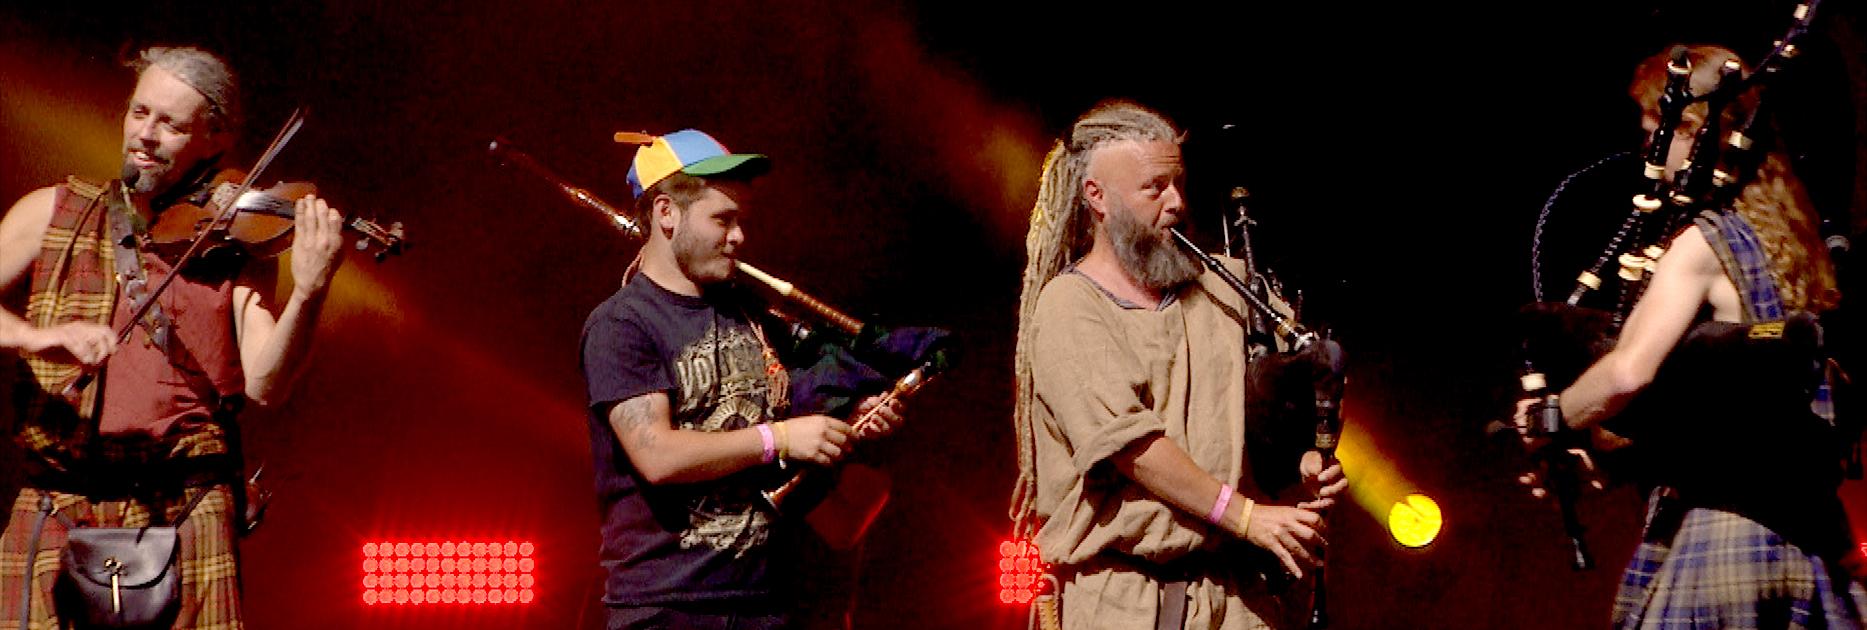 Castlefest-Full-Live-celtic-Concert-Rapalje-Celtic-Folk-Music